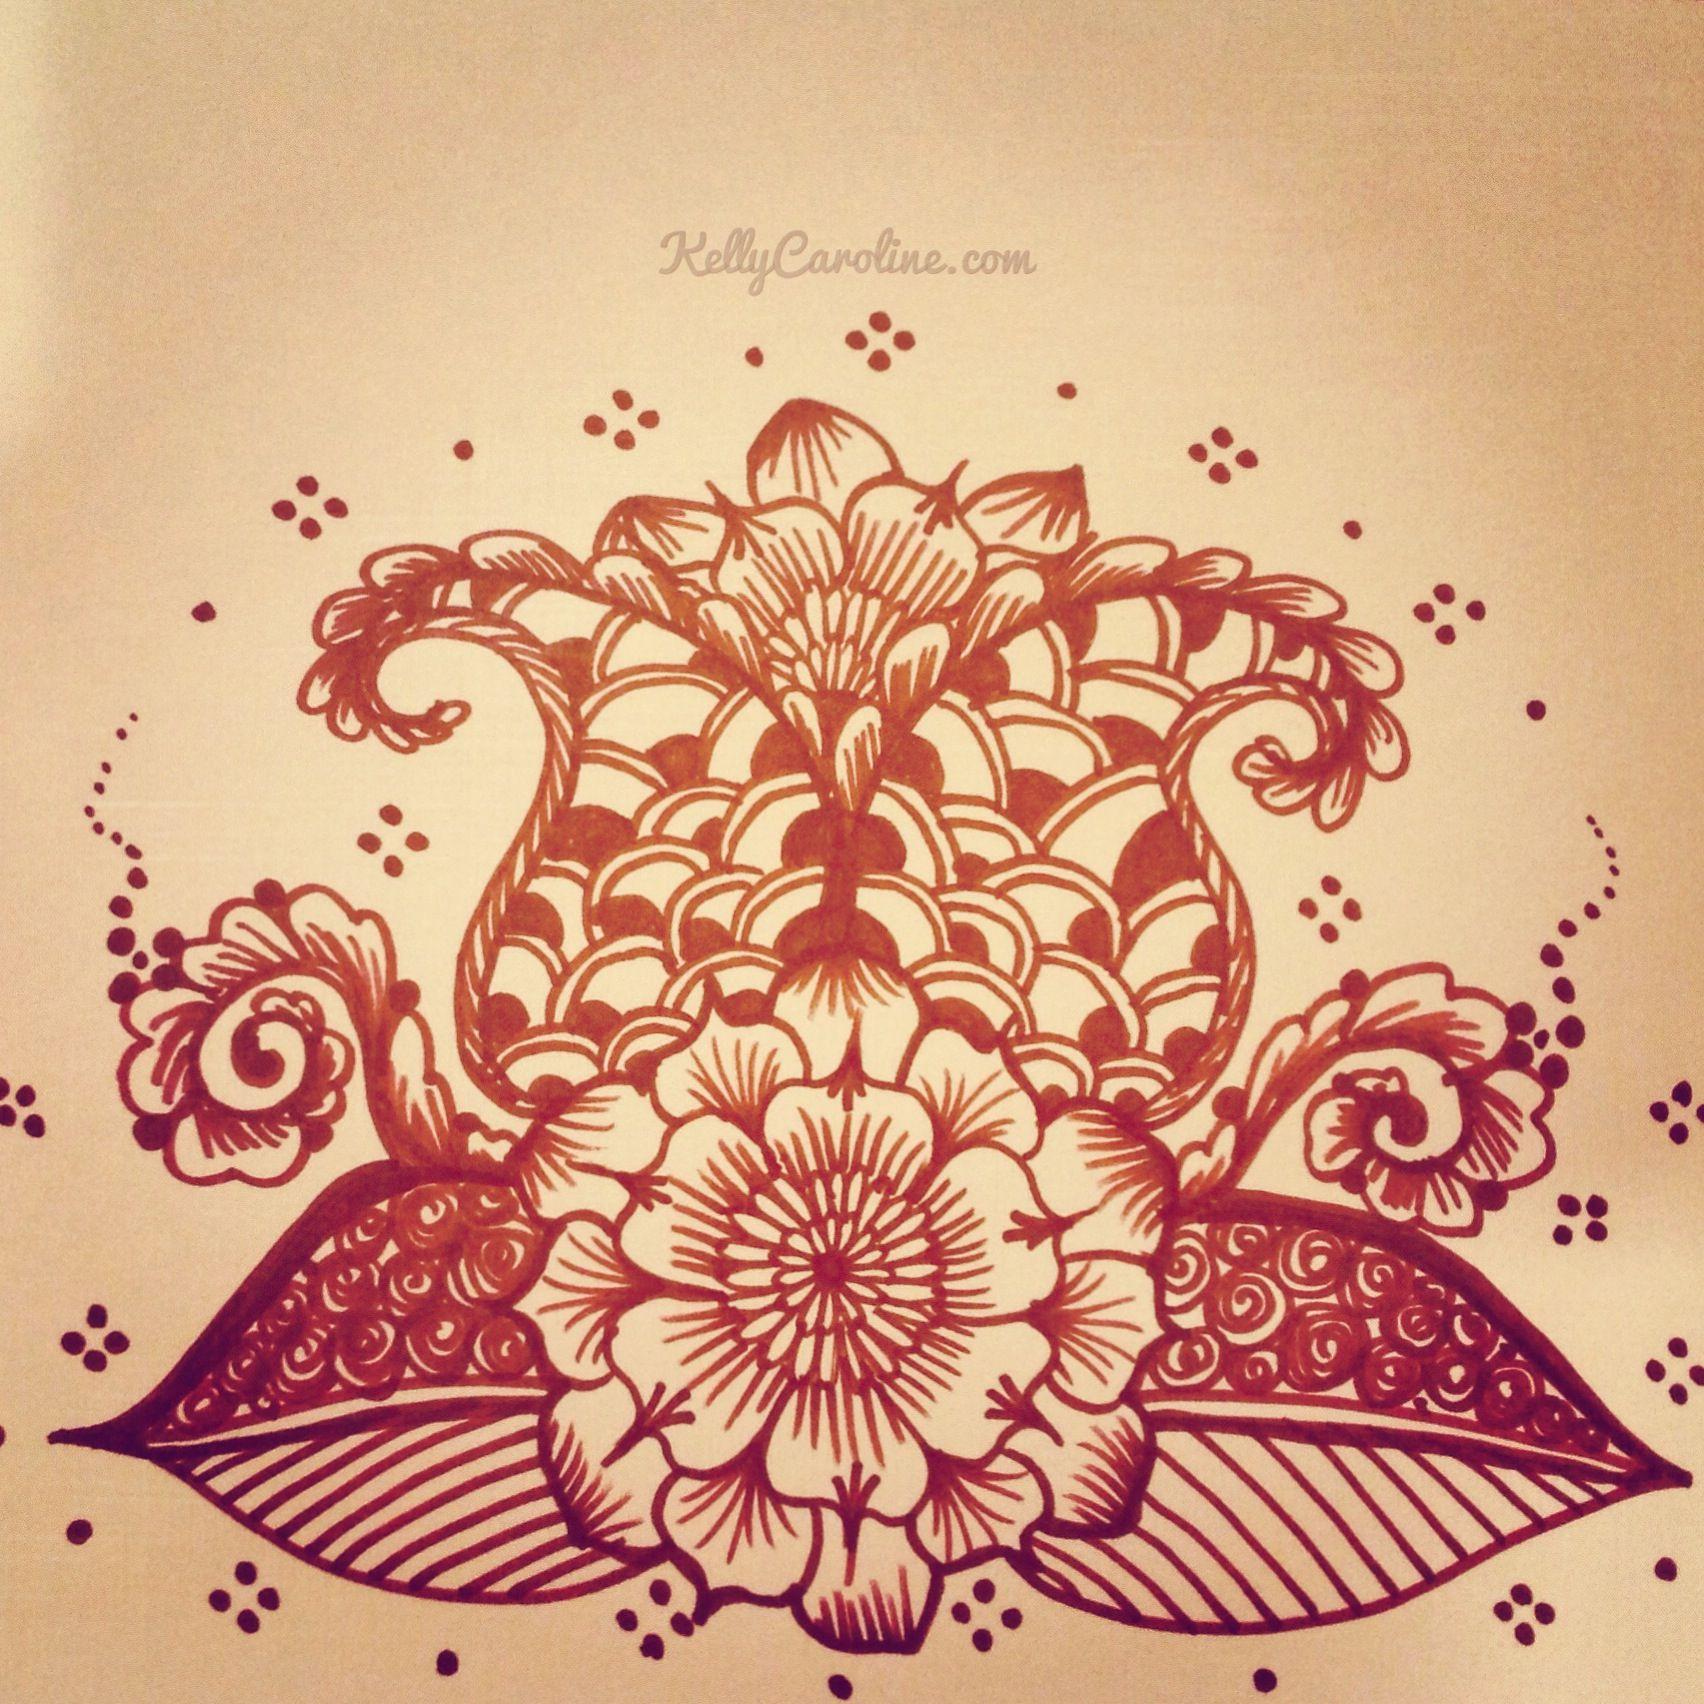 Pin By Kelly Caroline Henna Art On Henna Michigan Mehndi Artist In